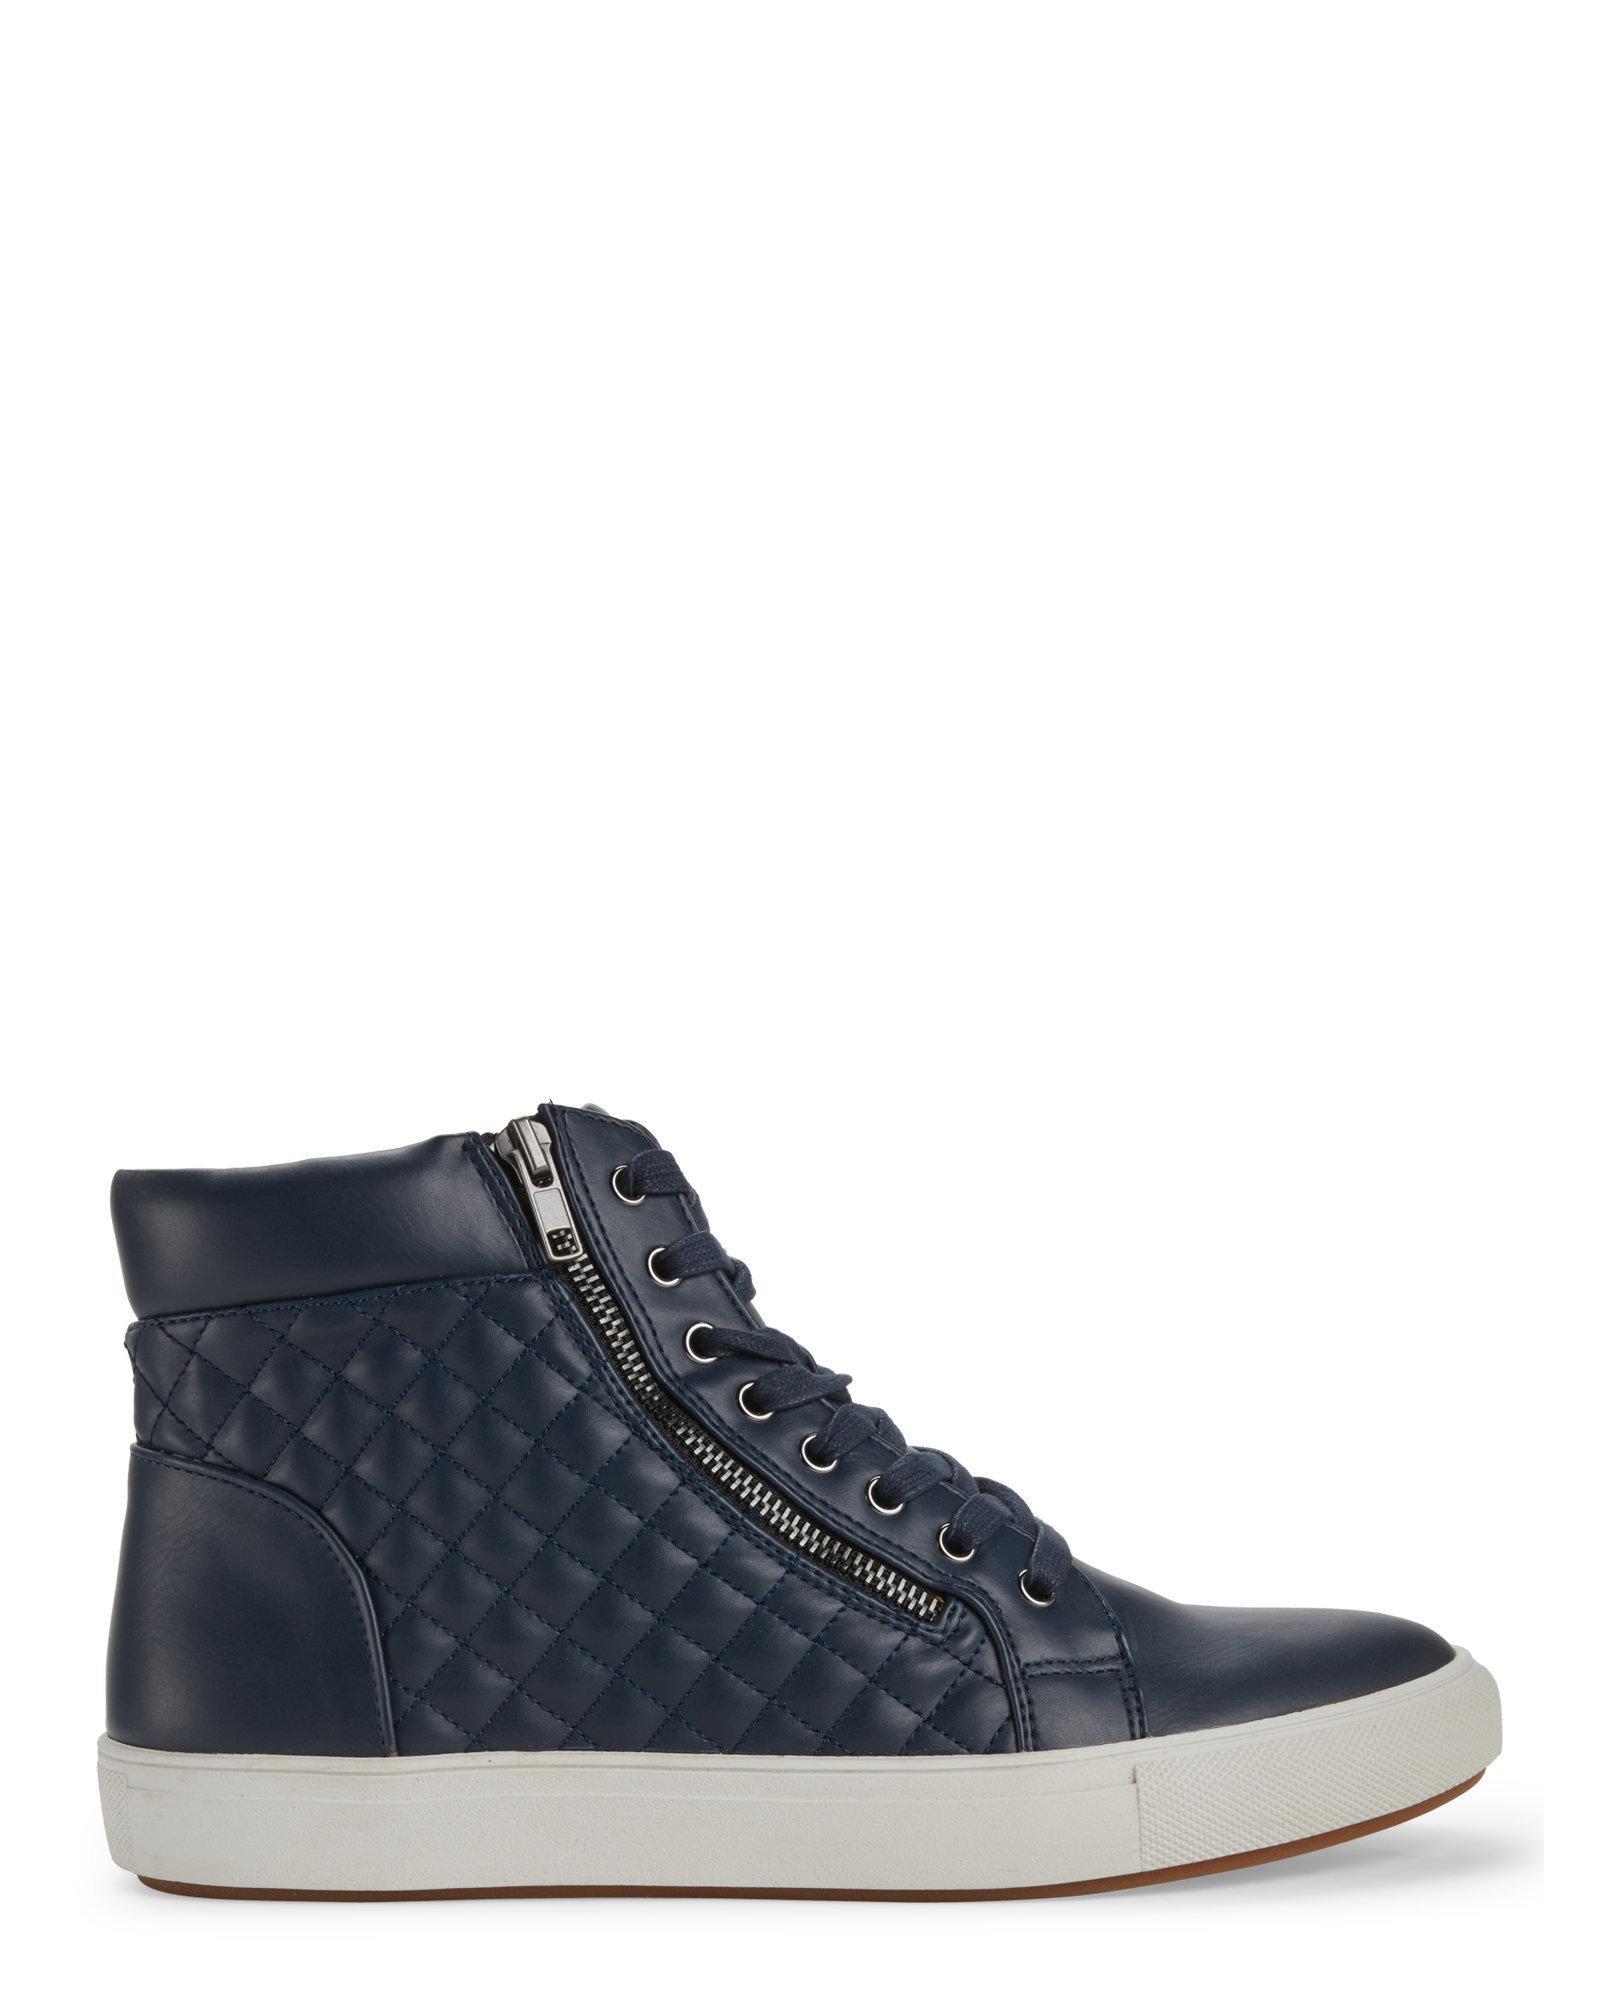 High Top Steve Madden Sneakers